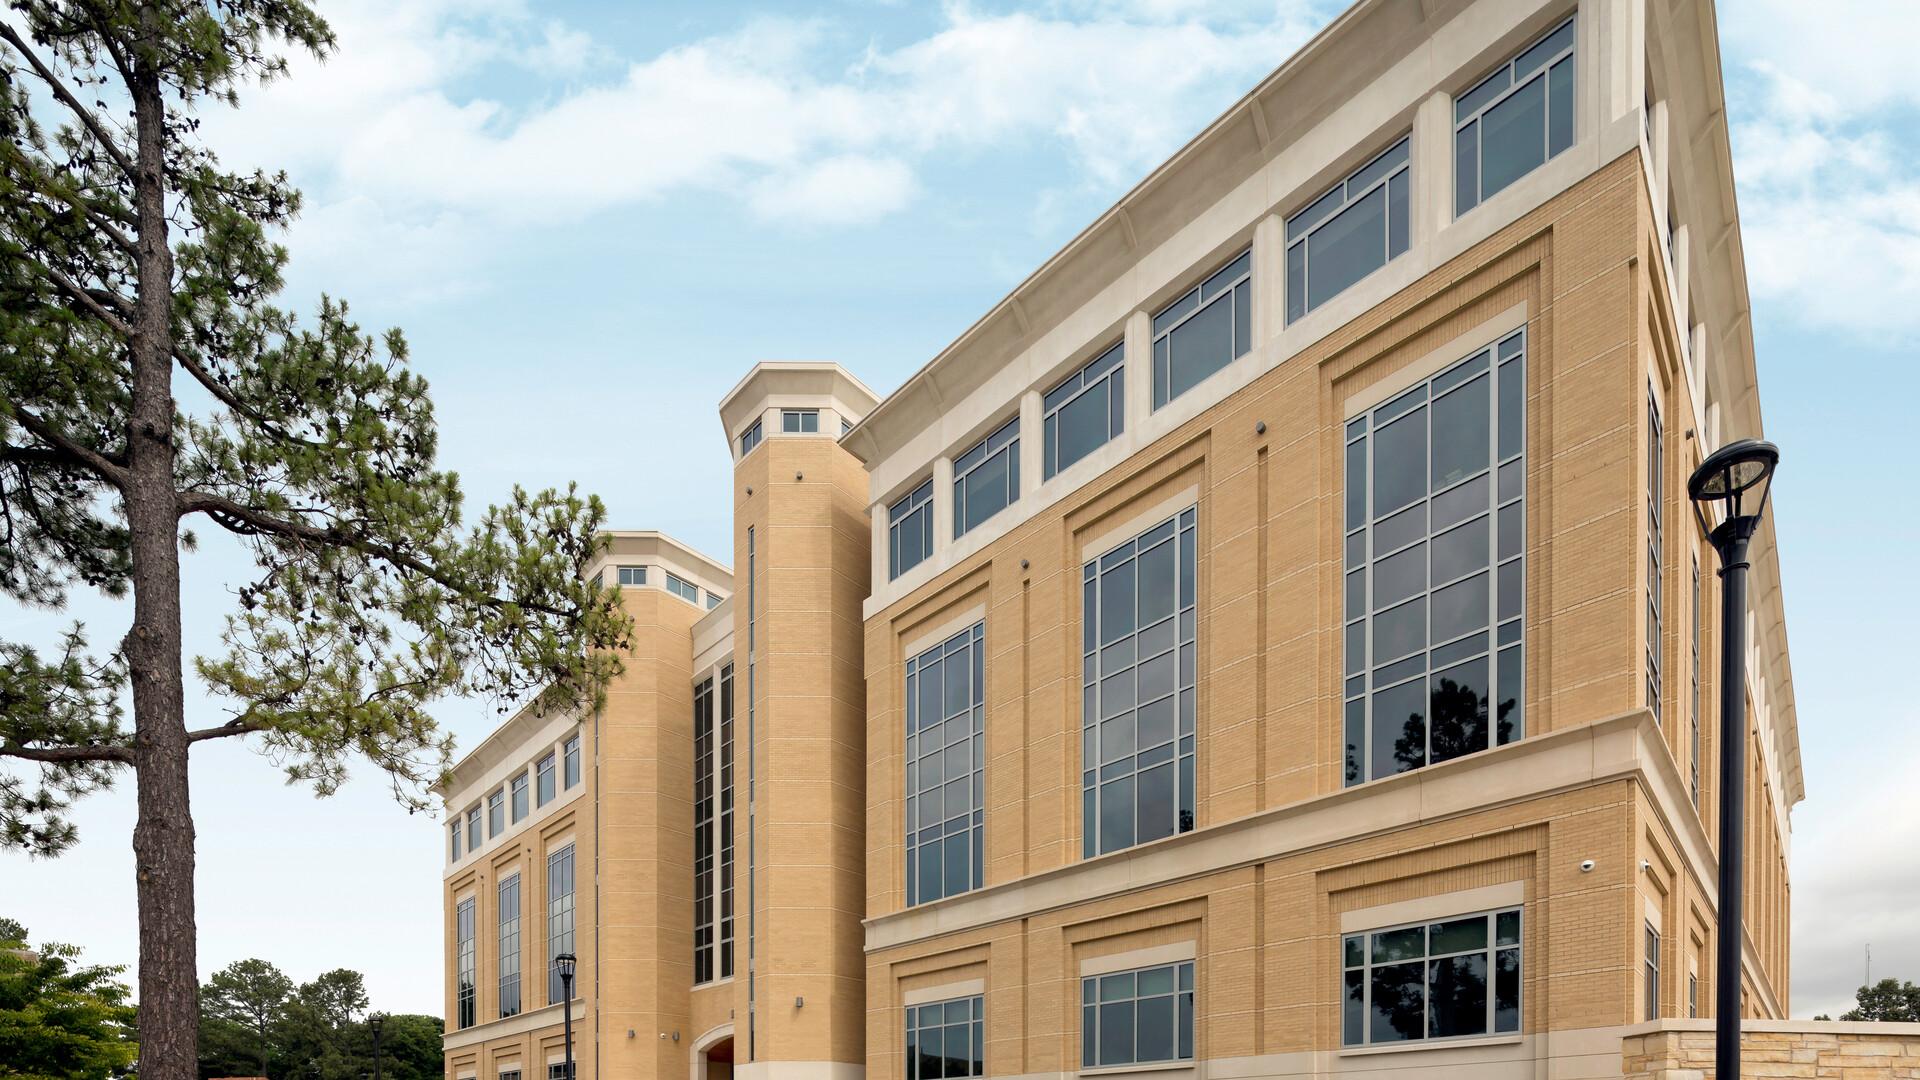 Arkansas State University HSS Building,Jonesboro,AR,USA,8361m²,Bolt Slot Ultraline 4500 Suspension System,AMR Architects Inc.,Arkansas State University,Curtis Construction,Robert Pepple of Pepple Photography,exterior